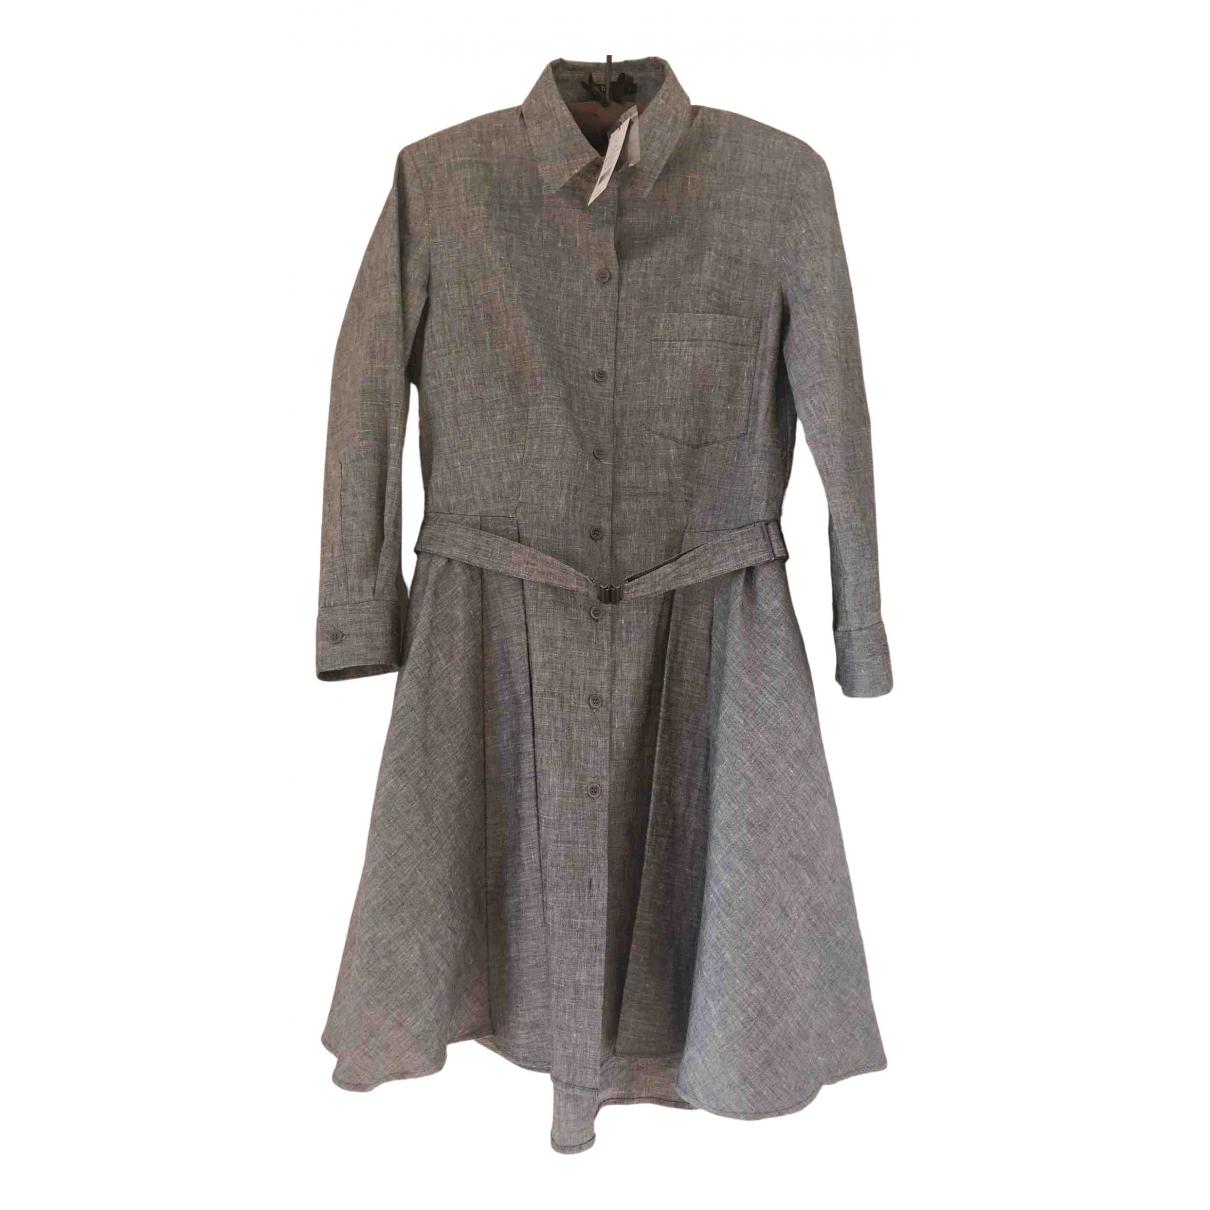 Theory \N Grey Linen dress for Women XS International